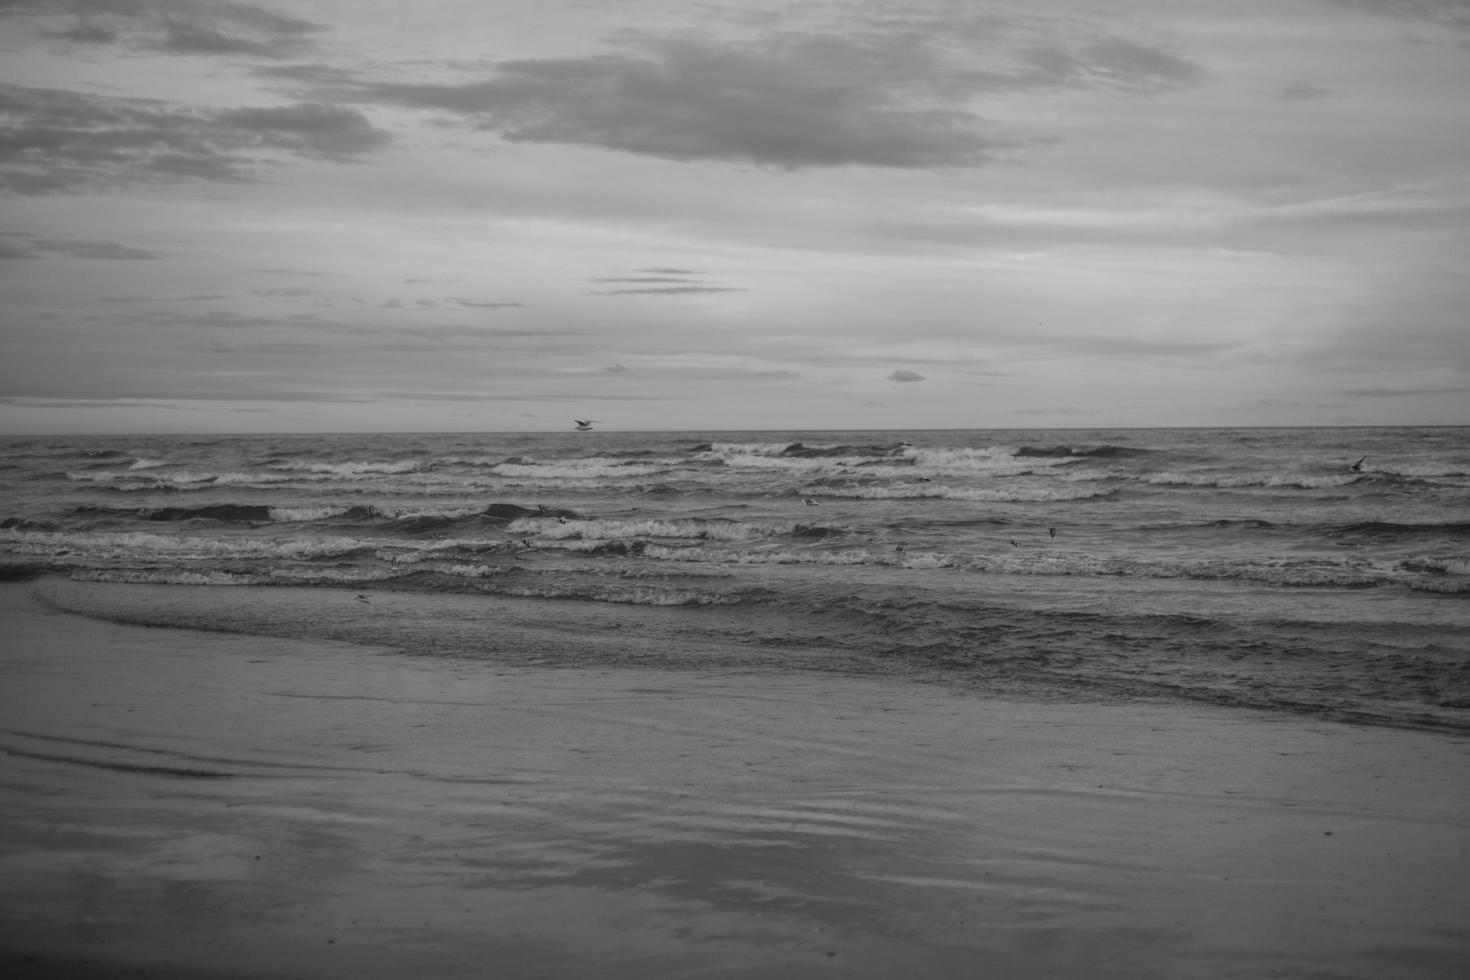 Grayscale ocean shoreline photo